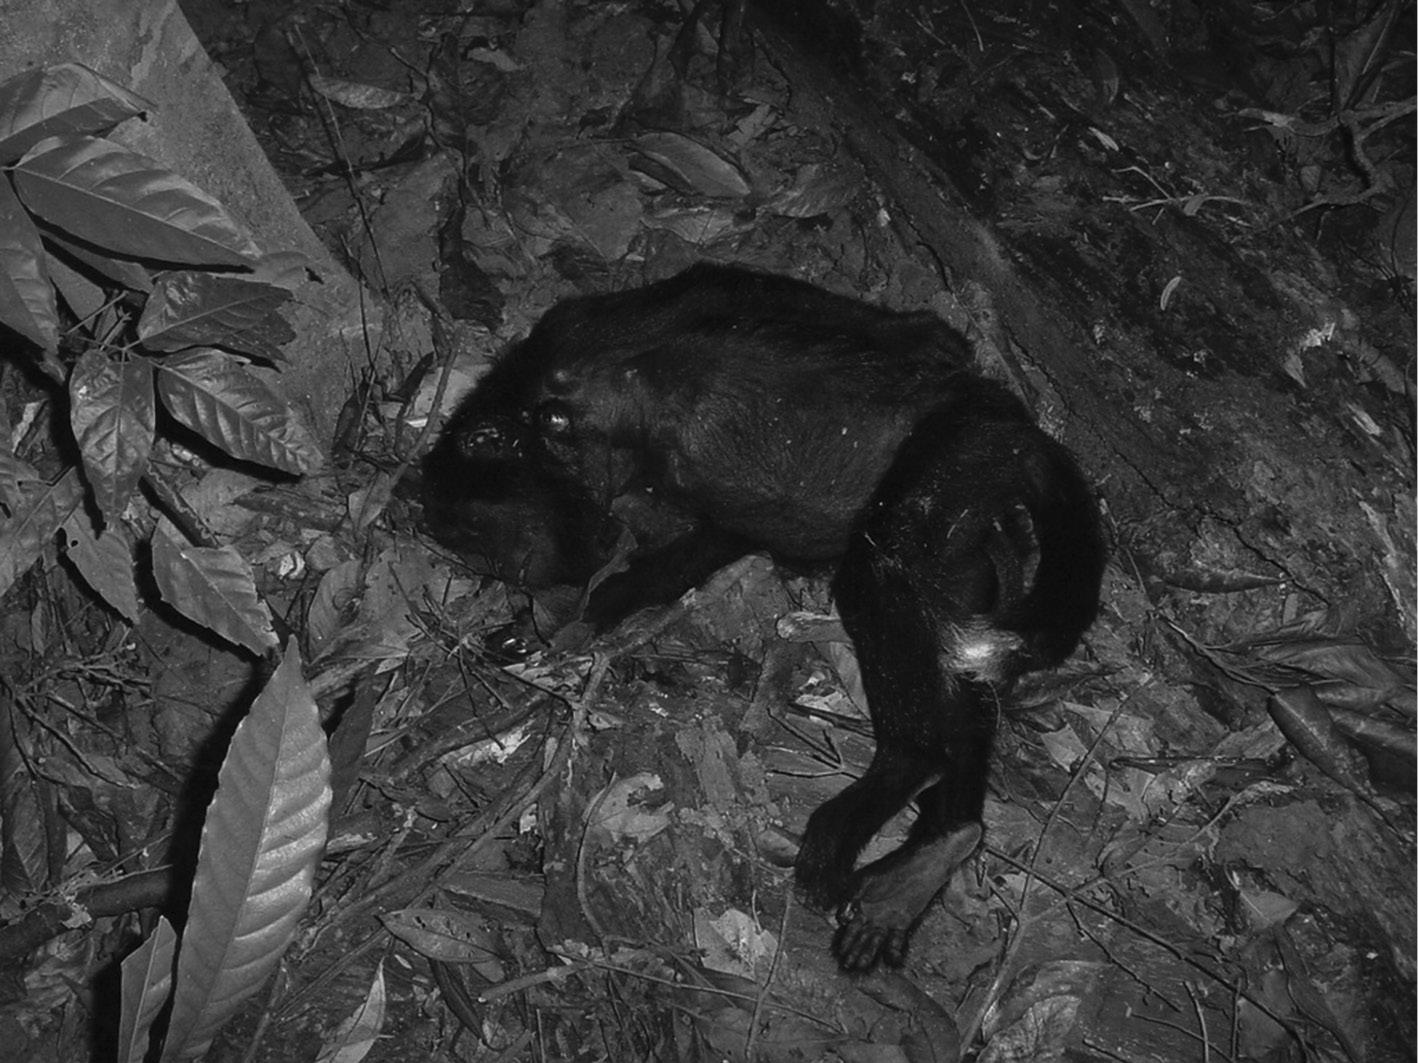 Conservation Case Studies (Part VI) - Primates in Flooded Habitats